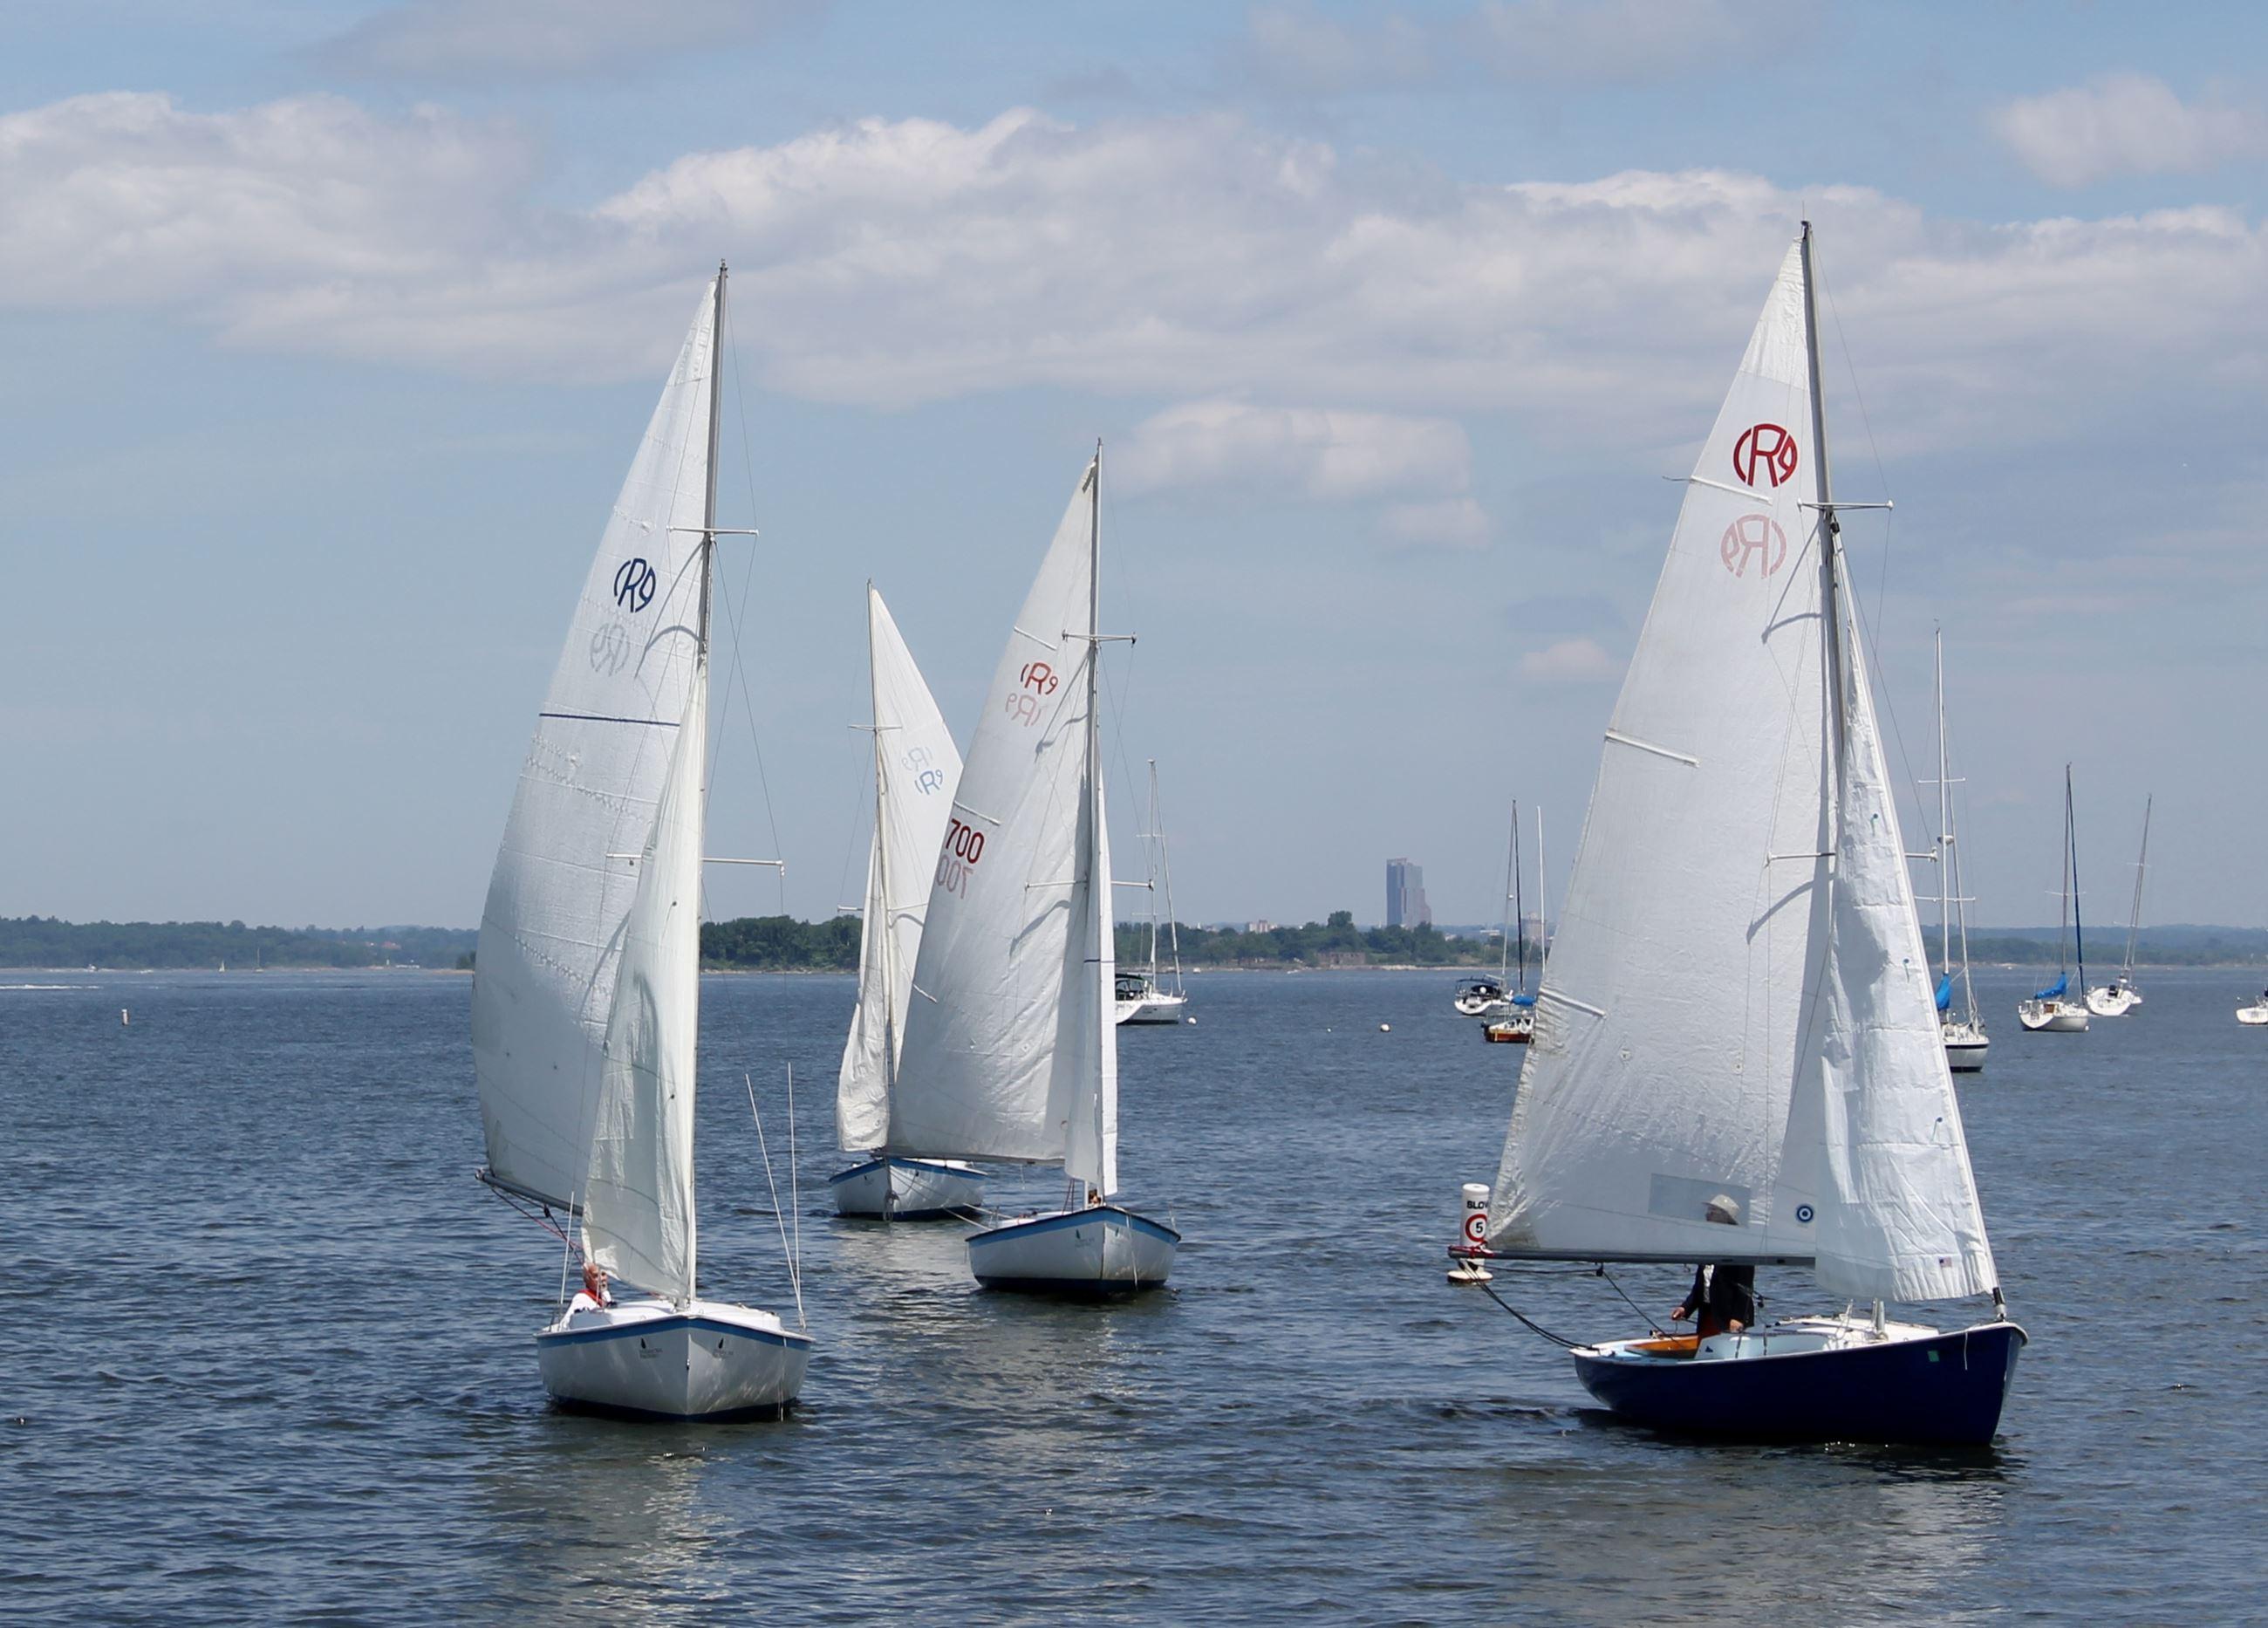 Kayak & Sailboat Rentals   Great Neck Park District, NY